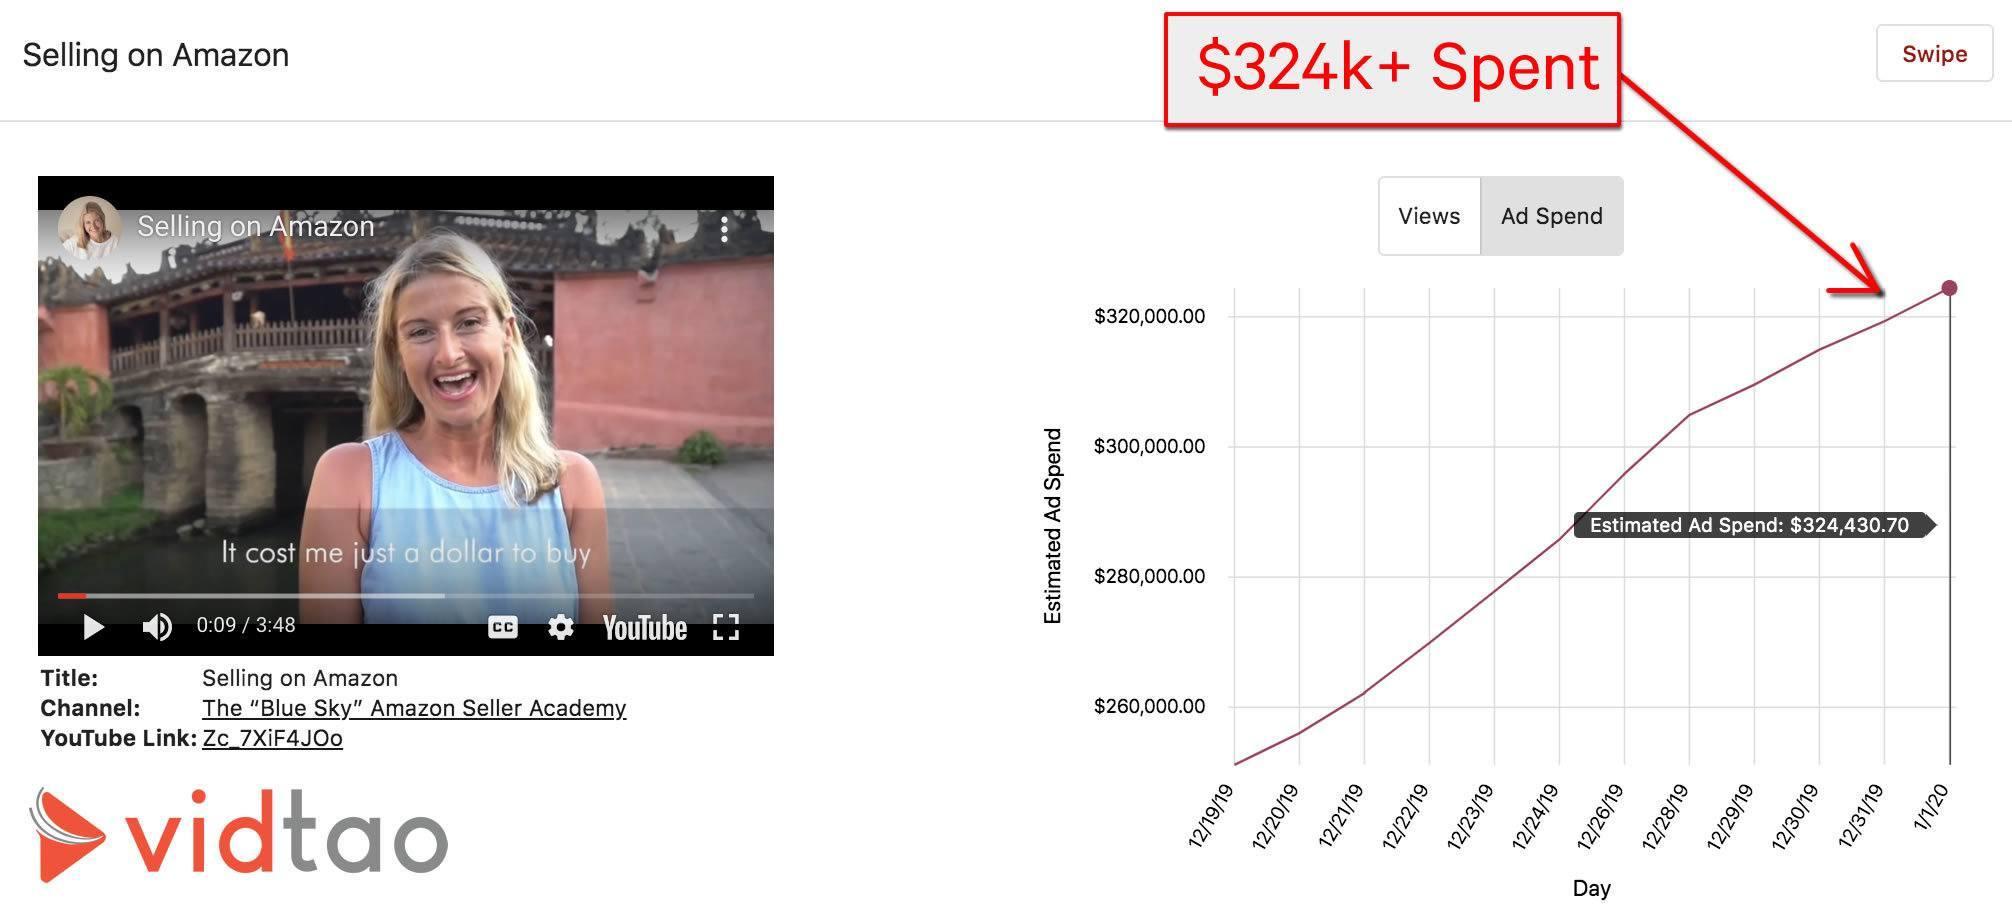 youtube-ad-spy-tool-screenshot-bluesky-amazon-screenshot-20200101-1